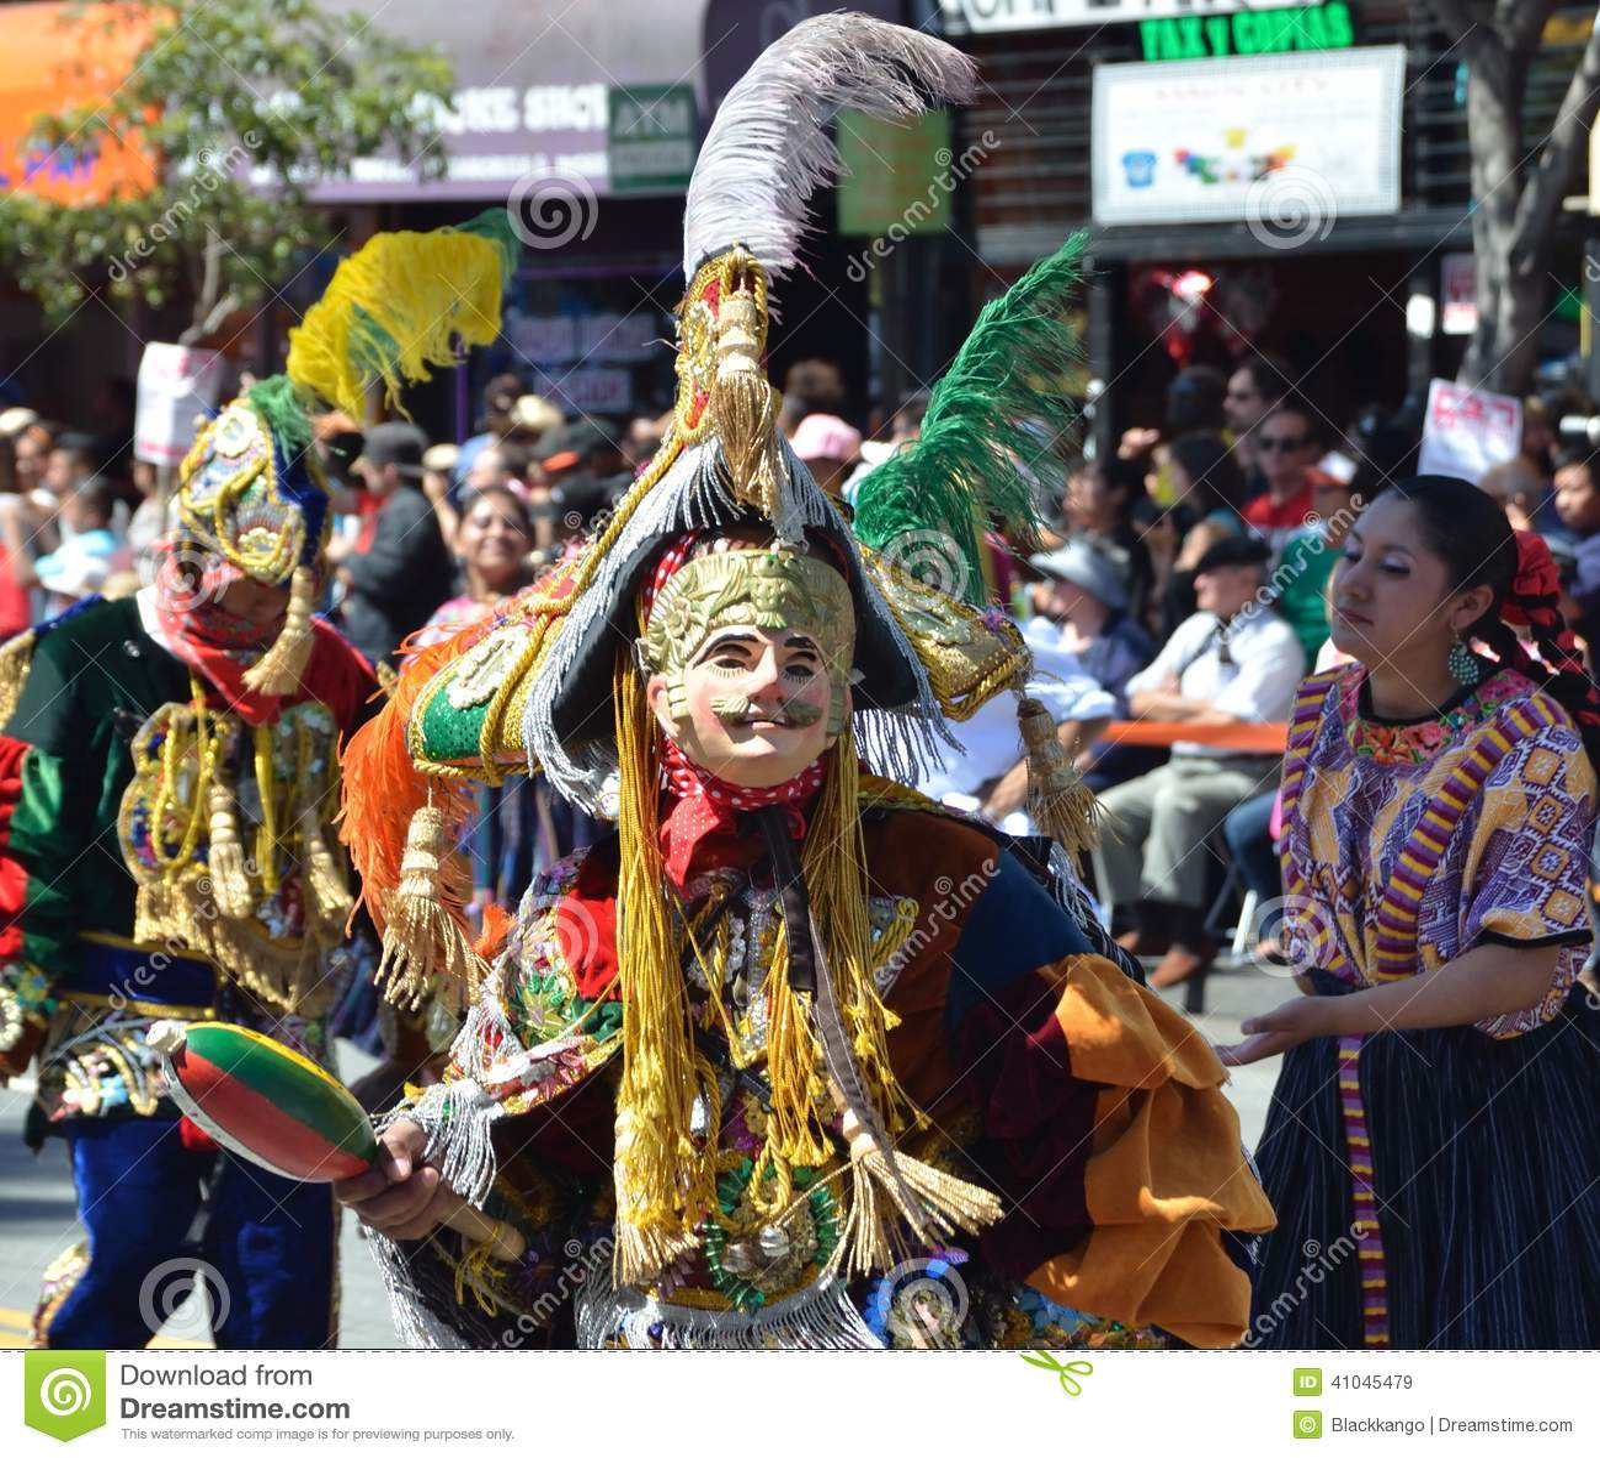 Parada grande de San Francisco Carnival 2014 no distrito da missão